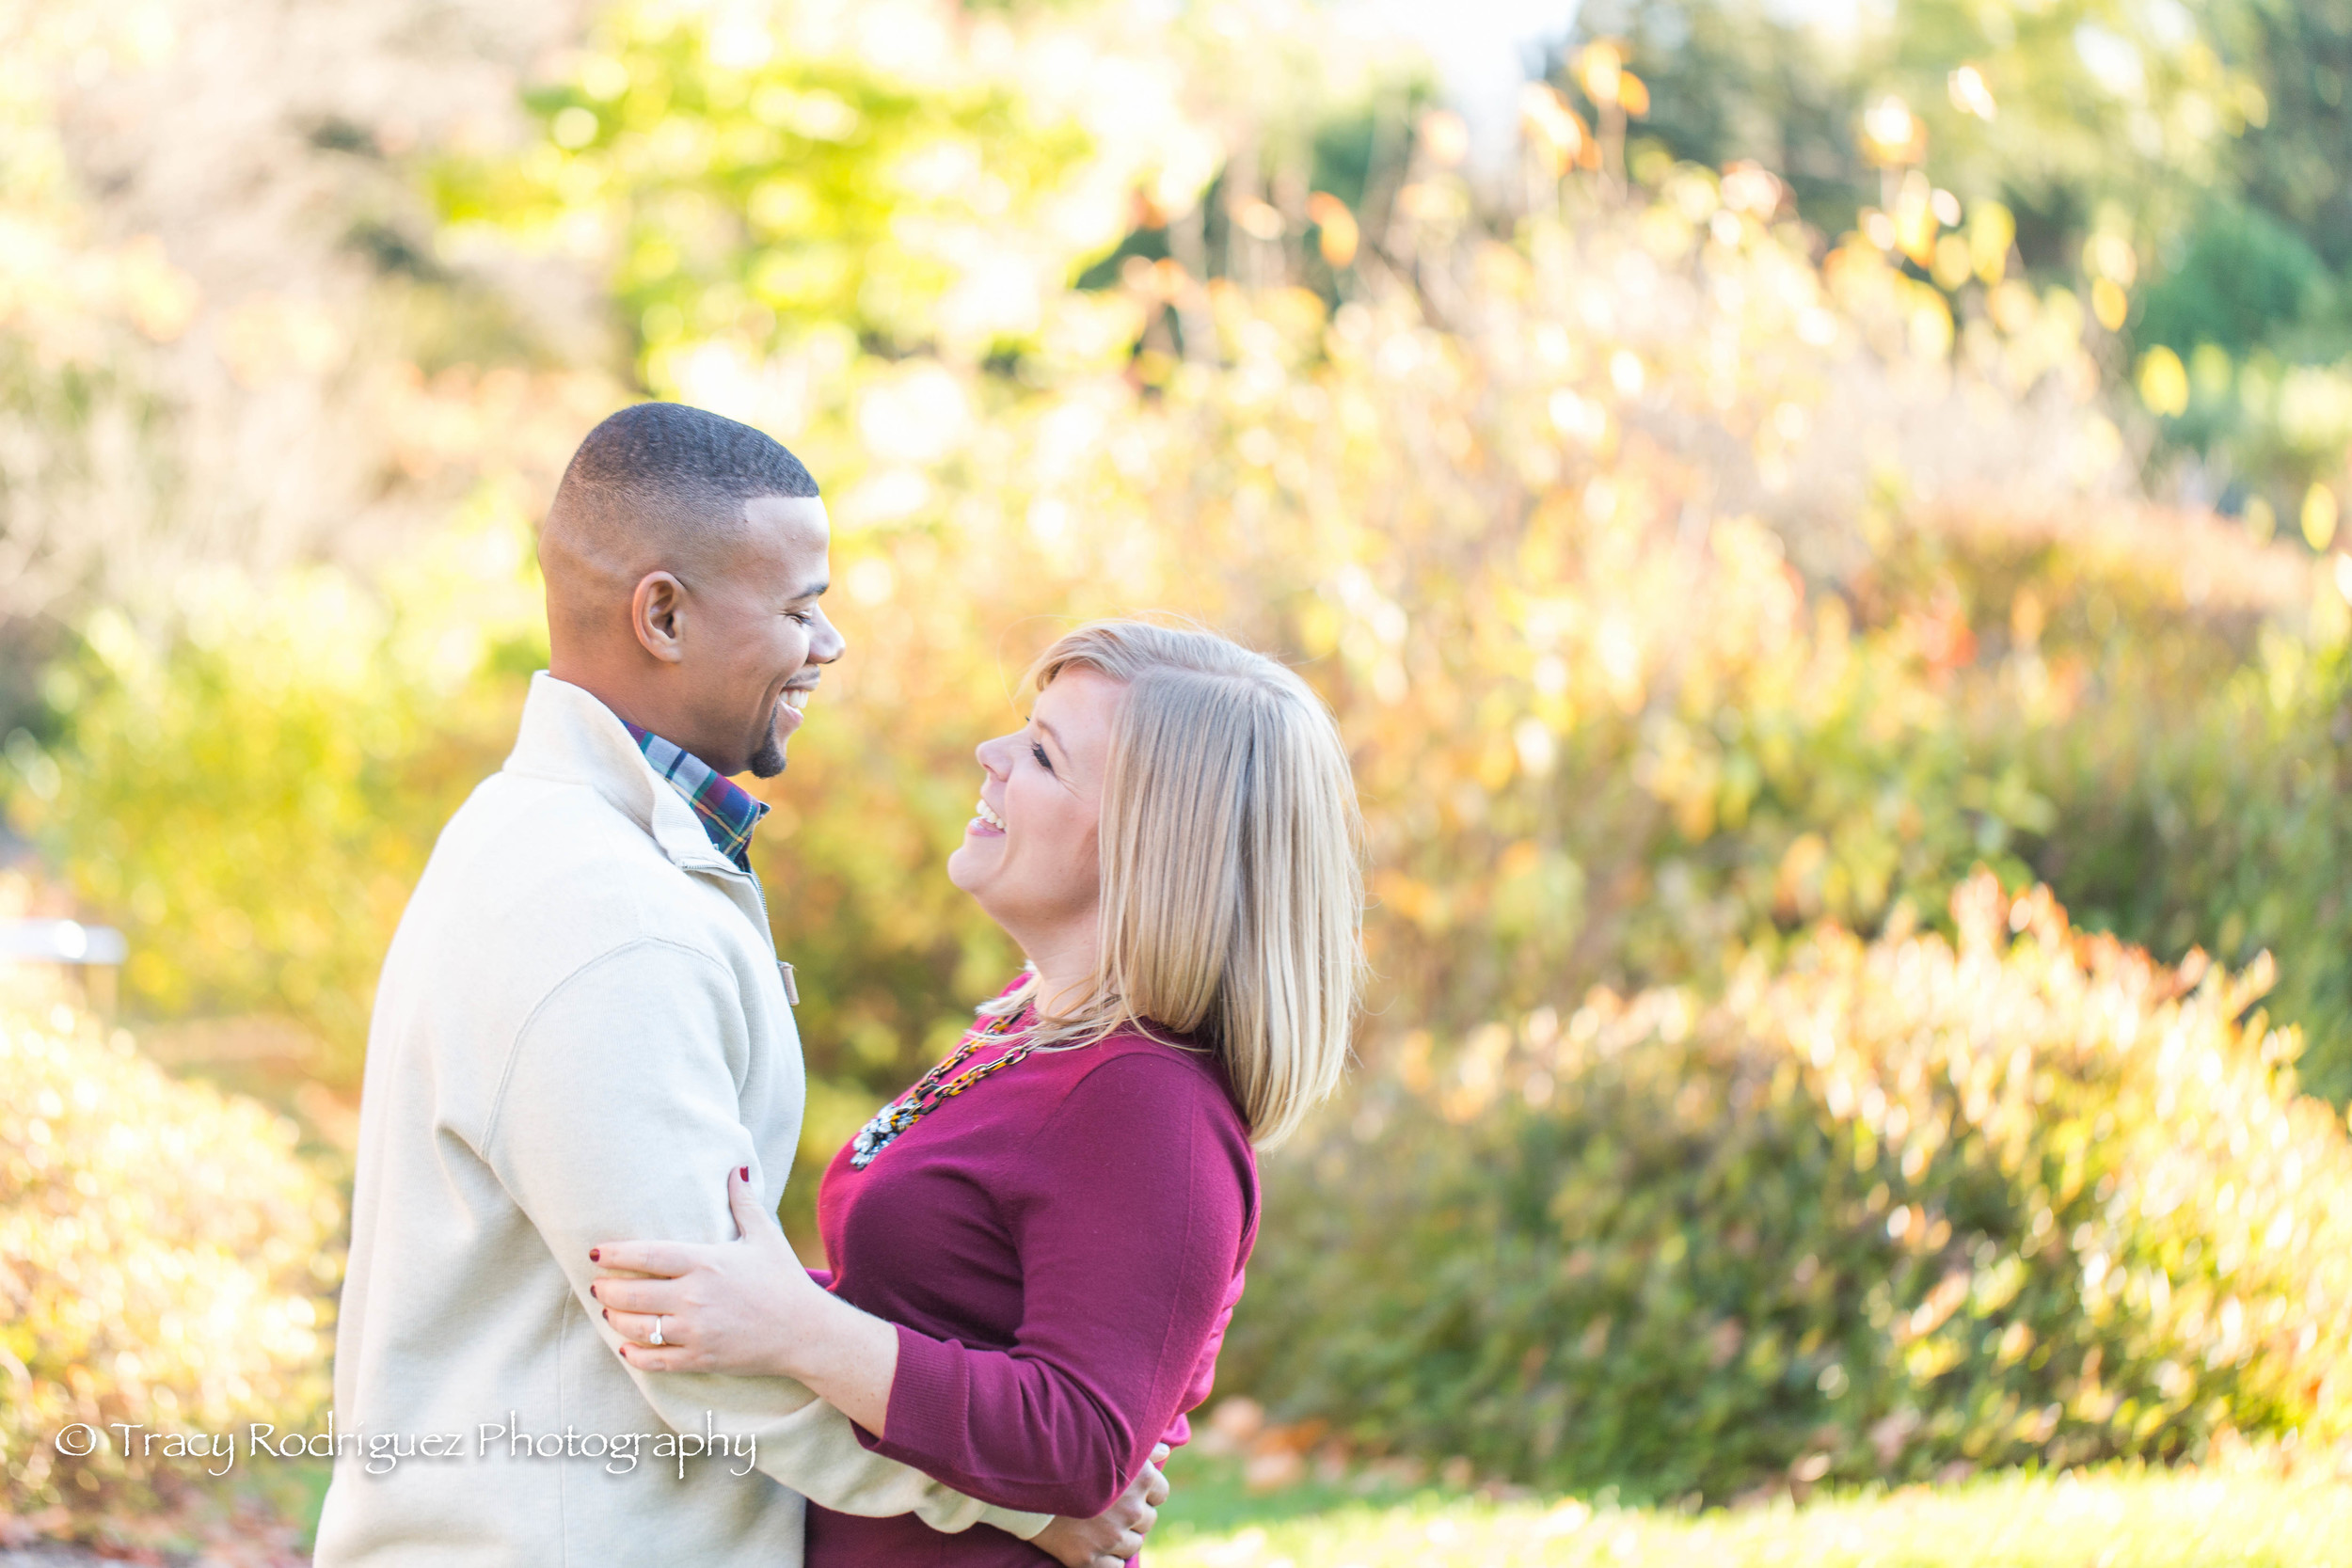 THR-Engagement-AshleyLeBron-2.jpg